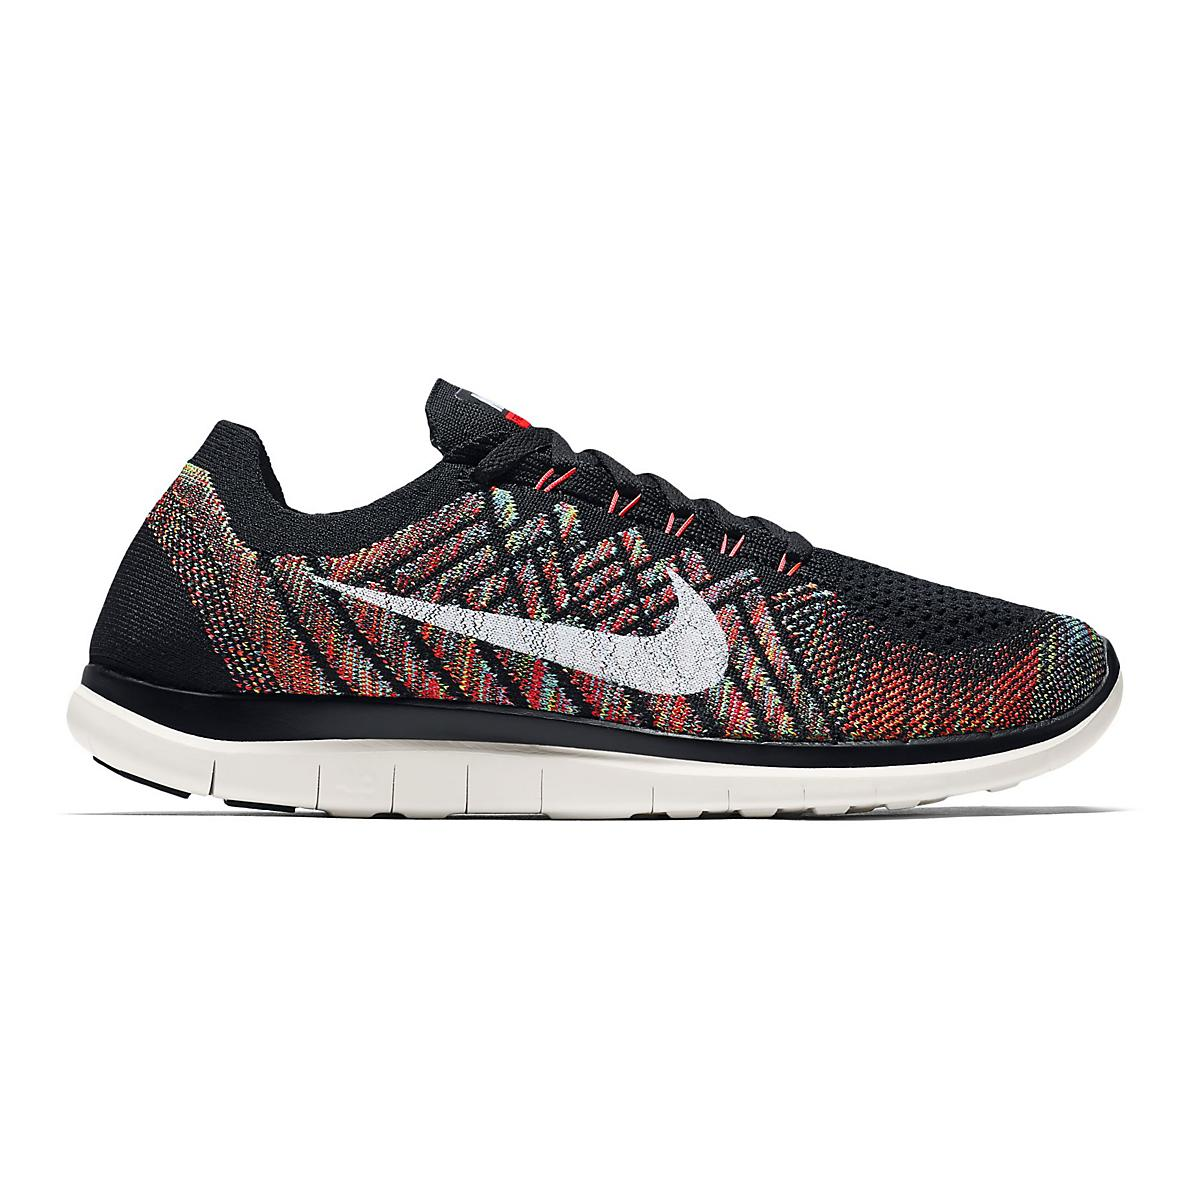 e3757b5cc91 Mens Nike Free 4.0 Flyknit Running Shoe at Road Runner Sports